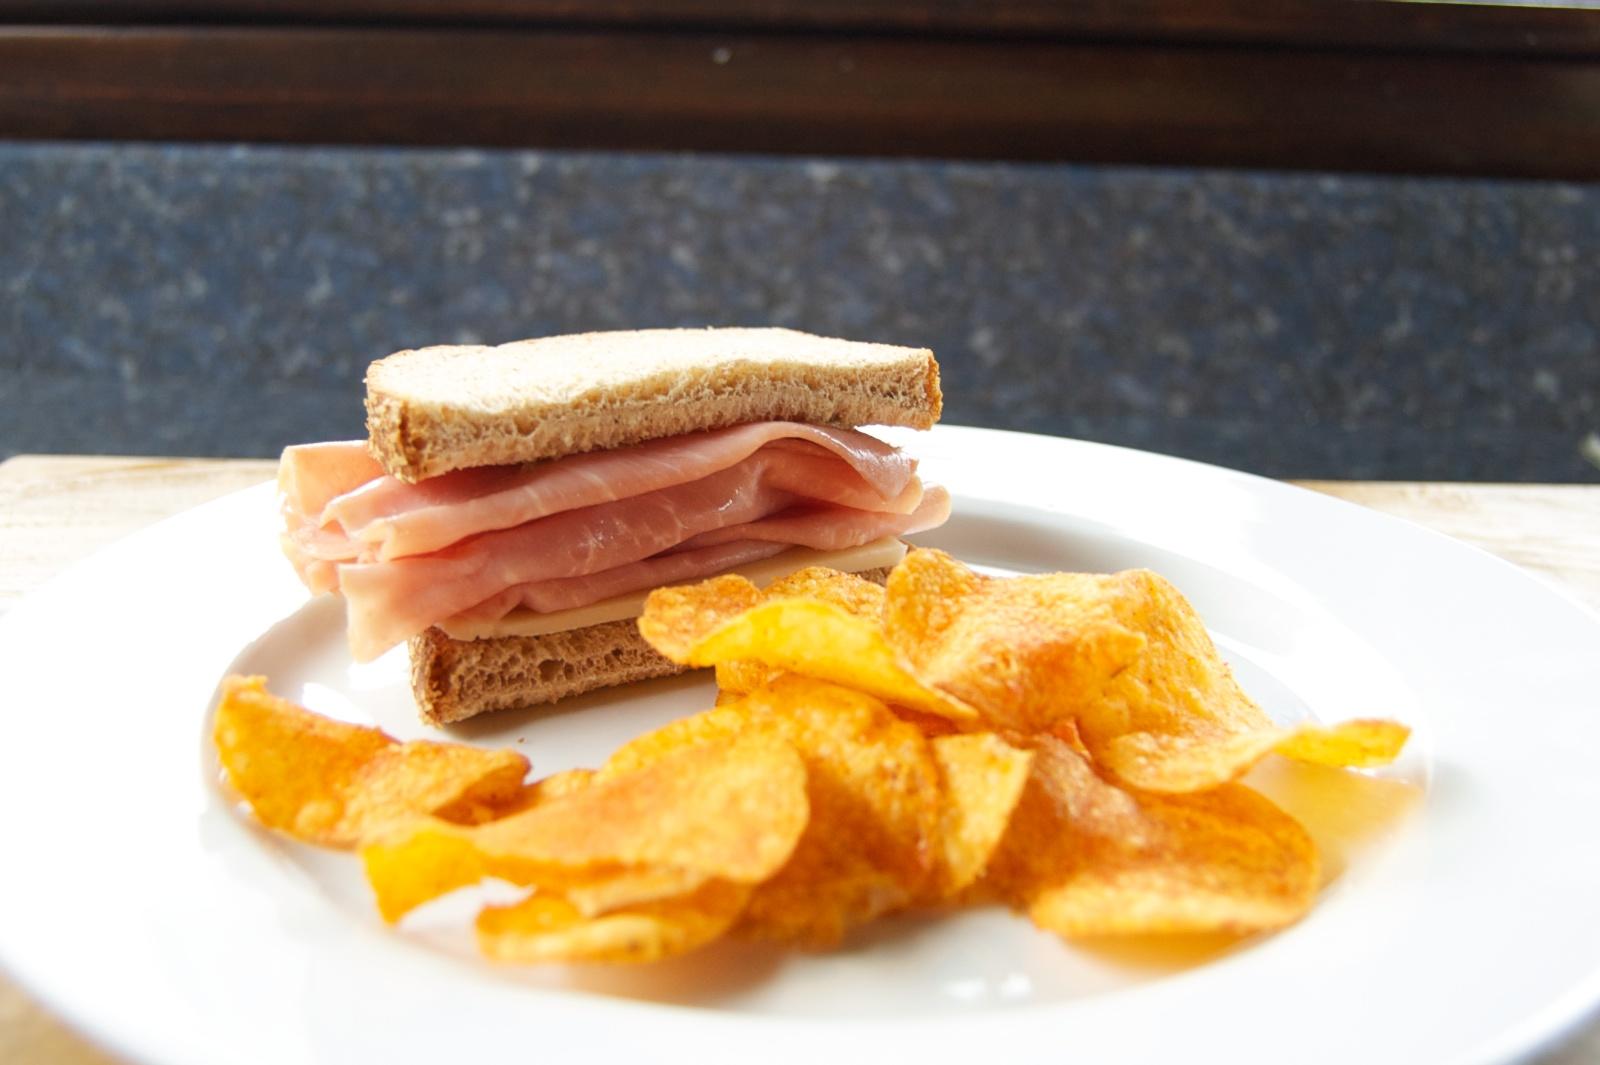 http://blog.rickk.com/food/2012/11/03/ate.2012.11.03.l.jpg